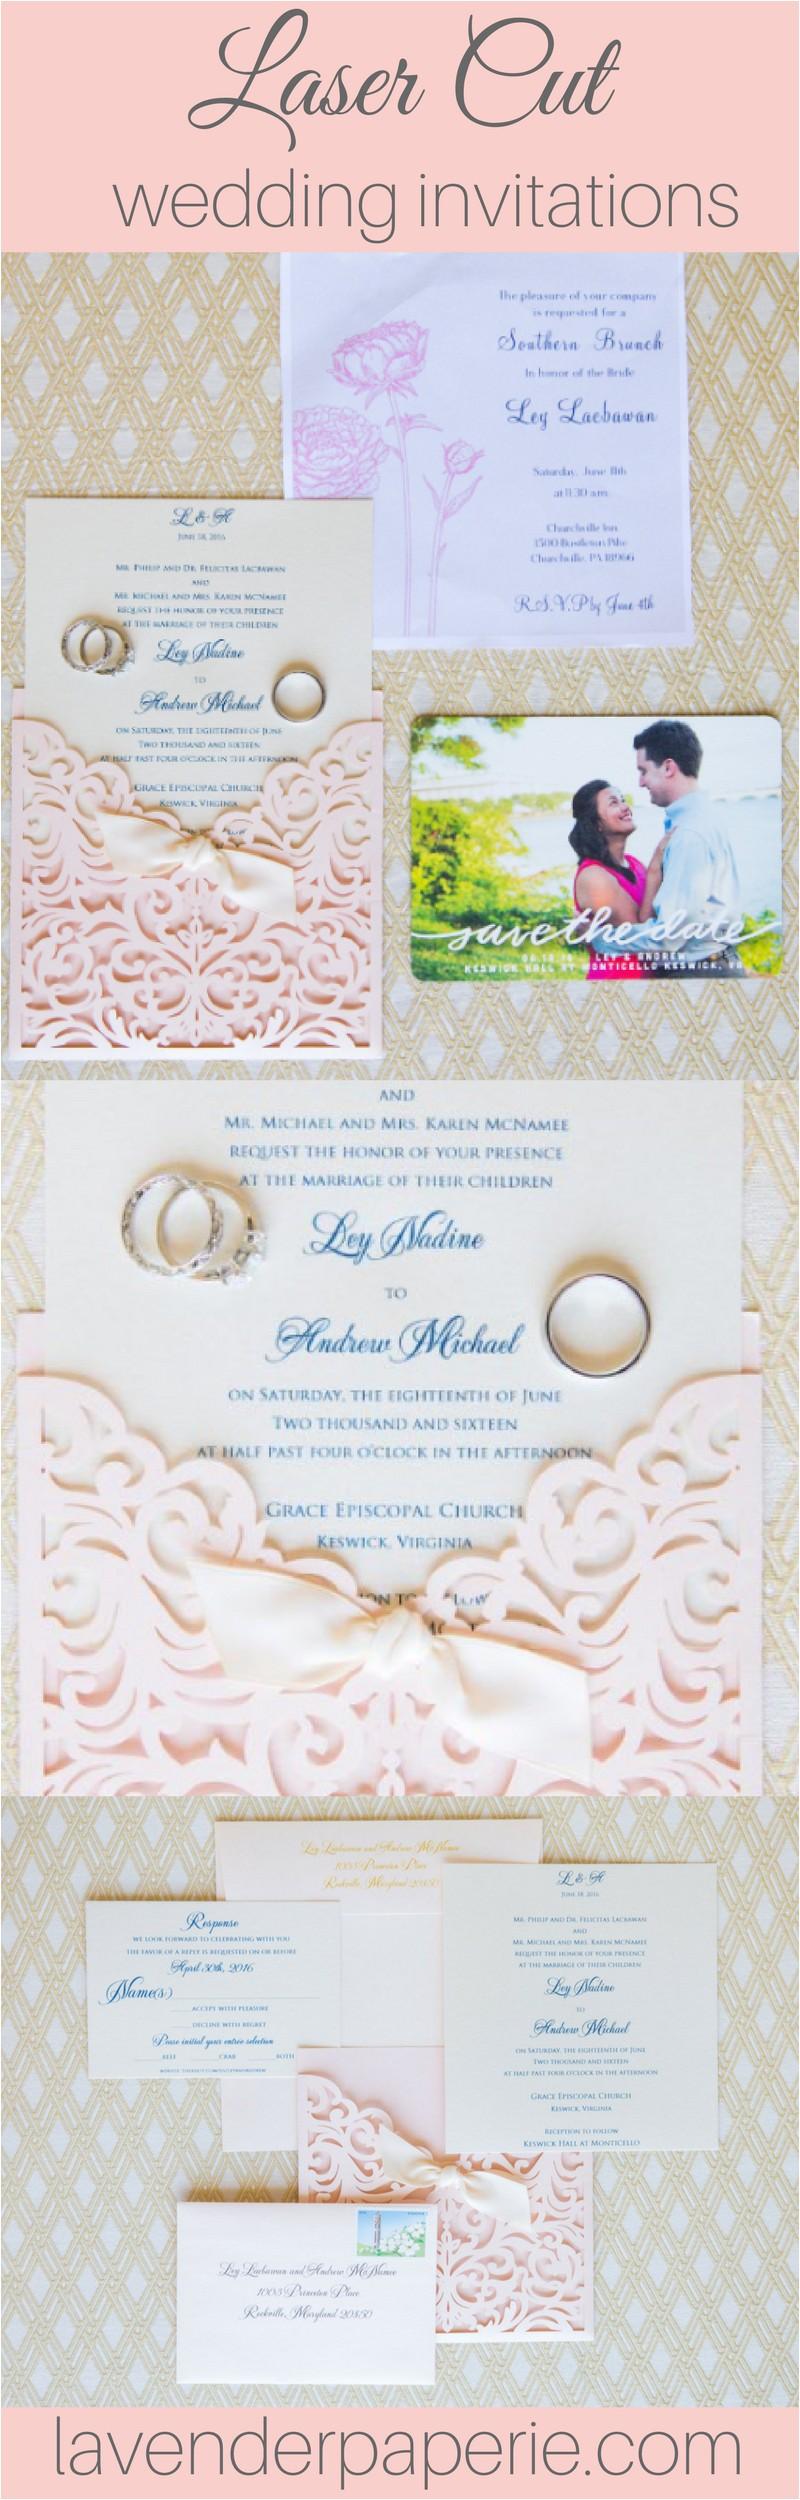 wedding invitation laser cut wedding invitation laser cut wedding invite vintage wedding invitation pocket blush wribbon knot